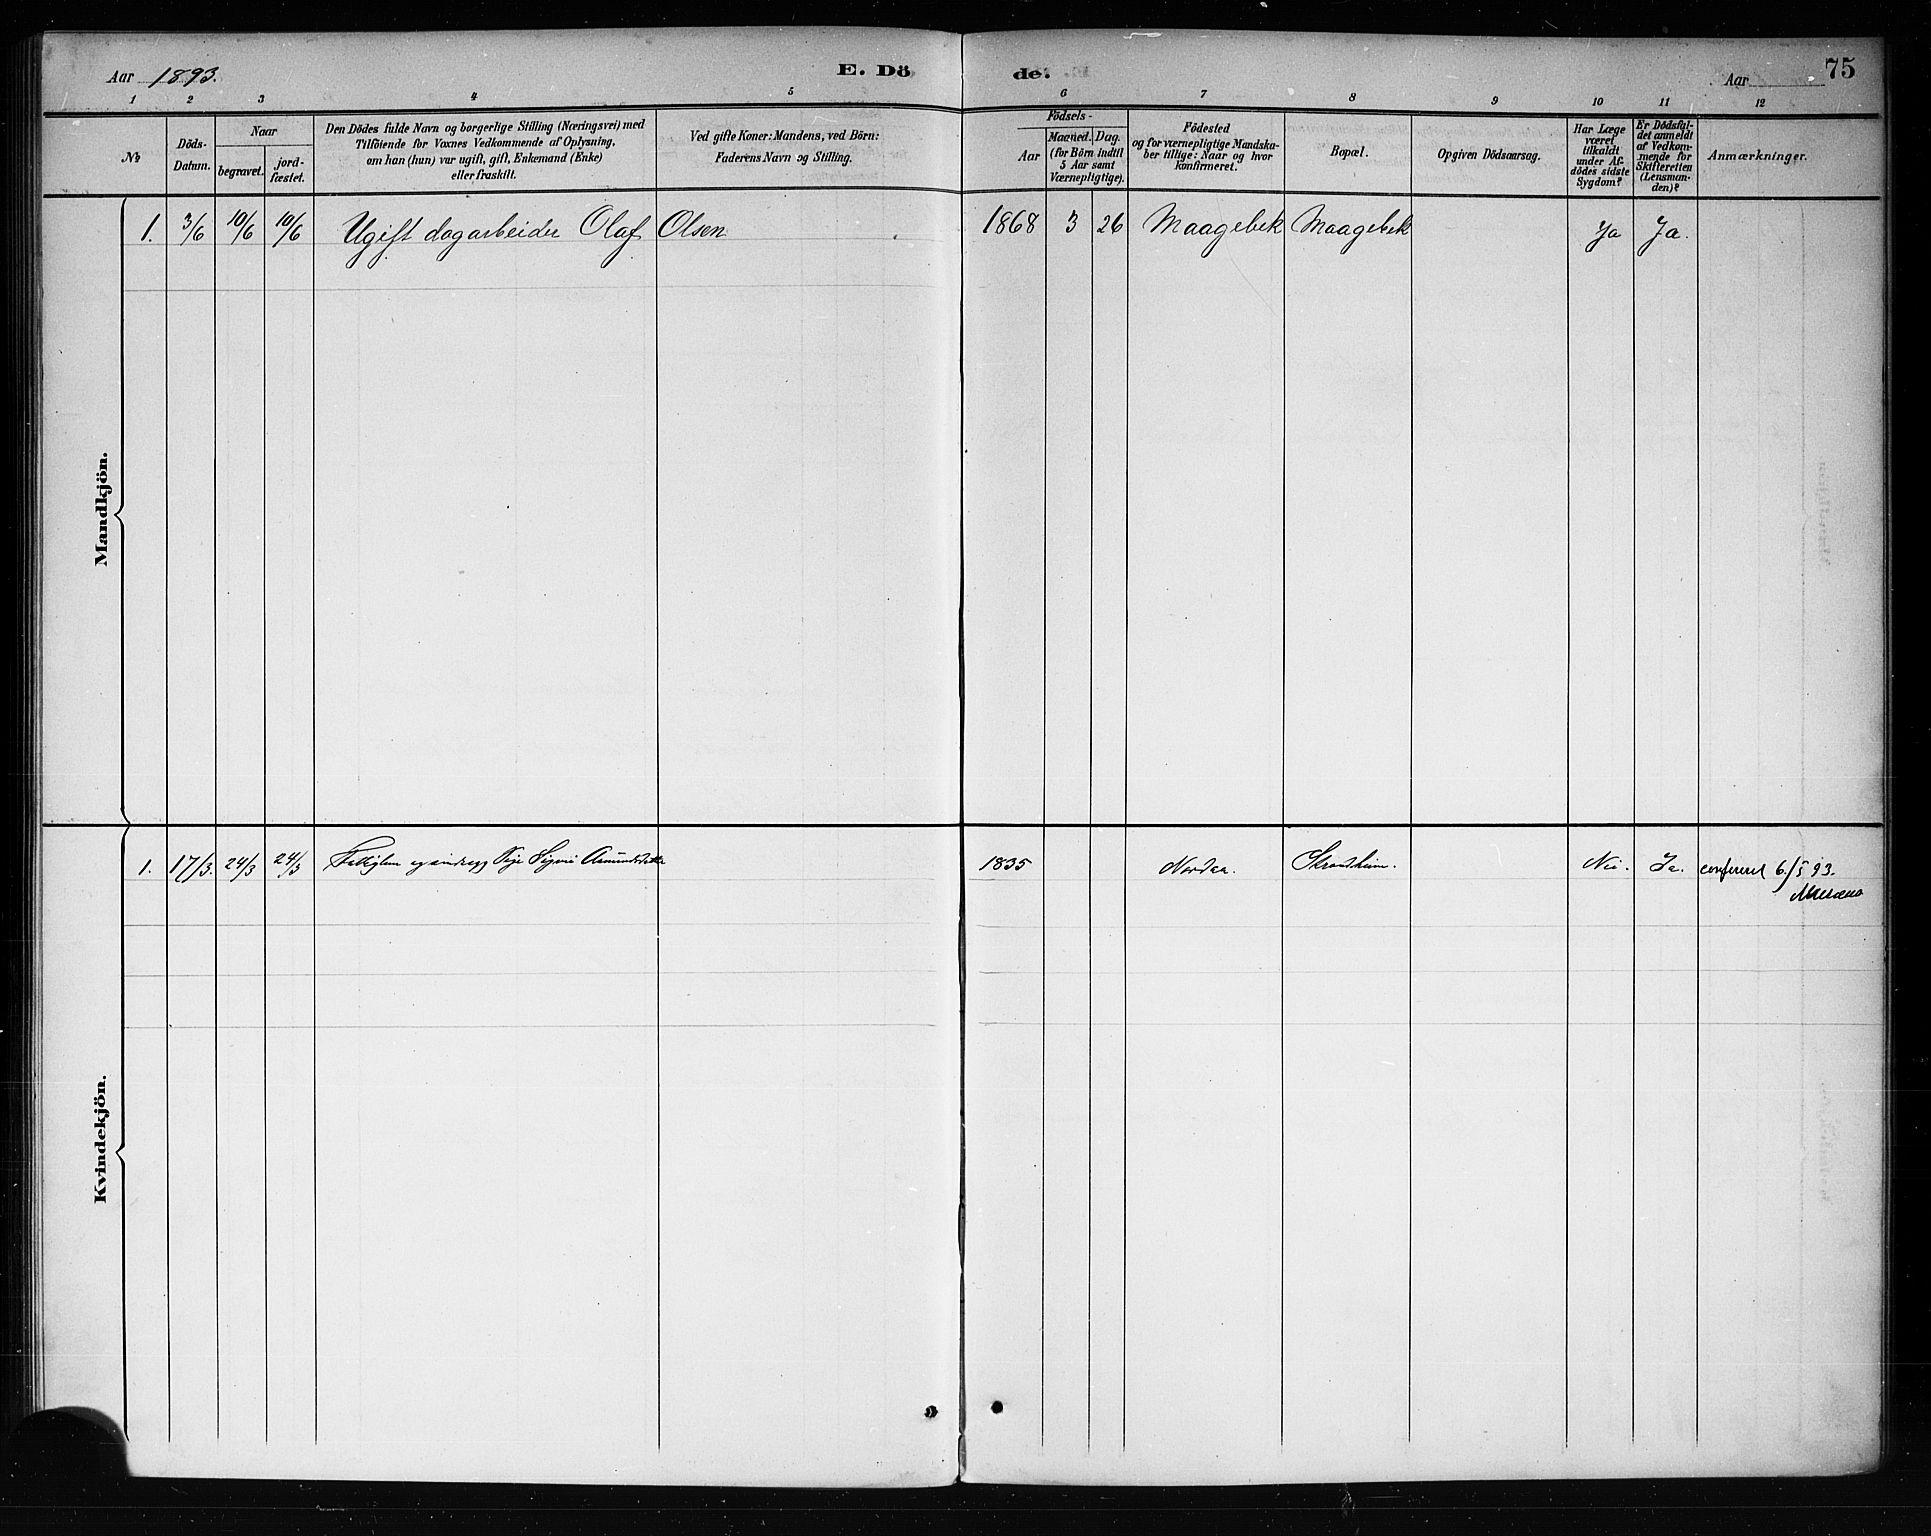 SAKO, Lårdal kirkebøker, G/Ga/L0003: Klokkerbok nr. I 3, 1891-1918, s. 75